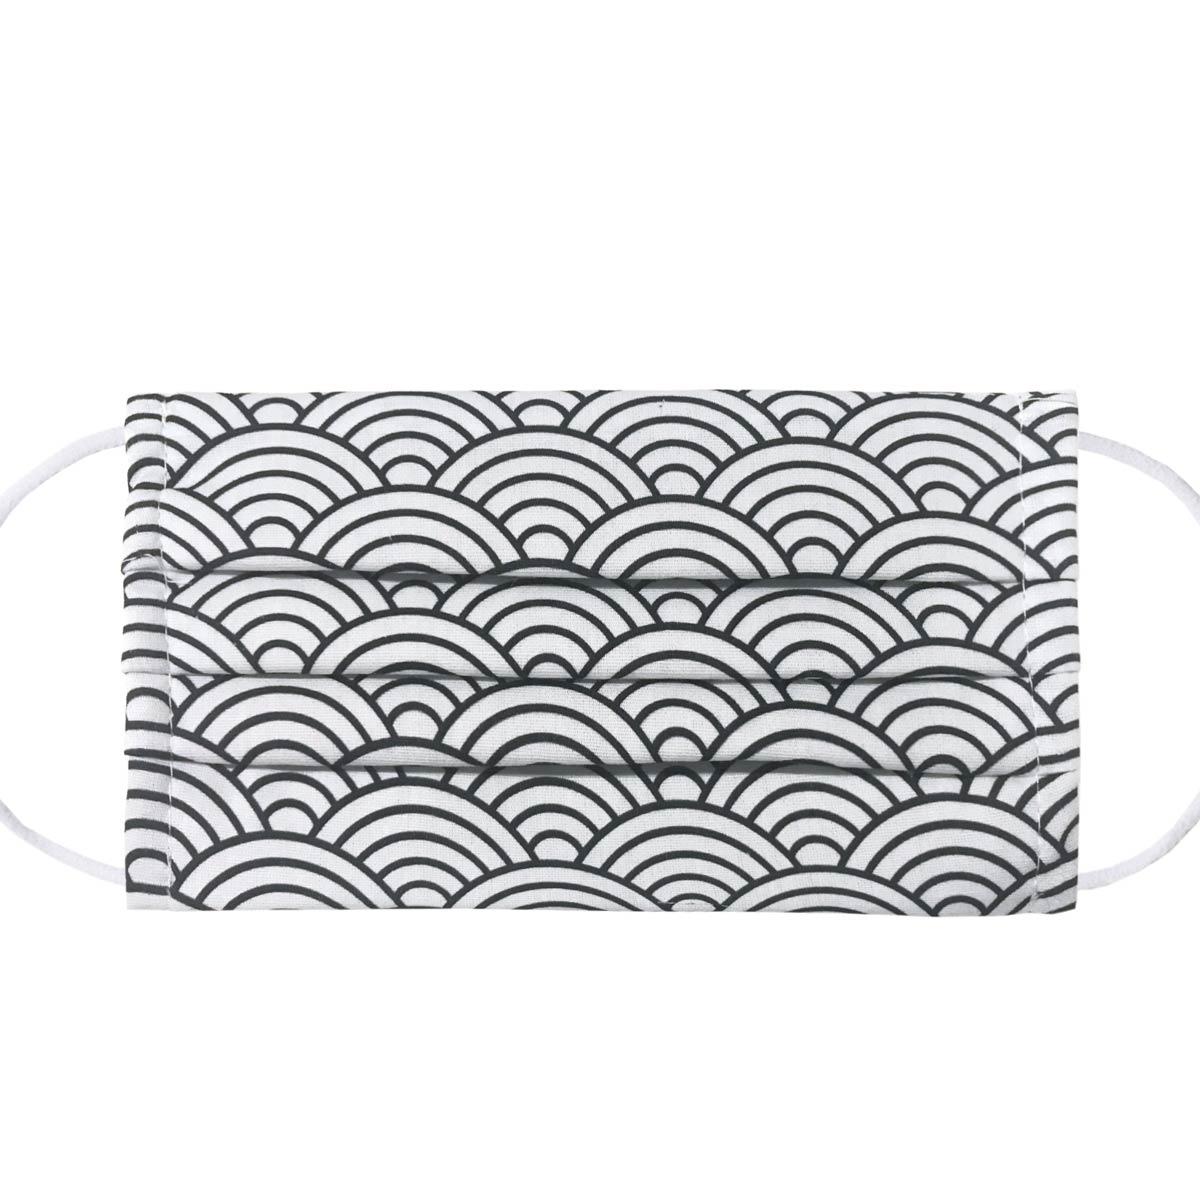 AT-06284-F12-masque-tissu-lavable-noir-blanc